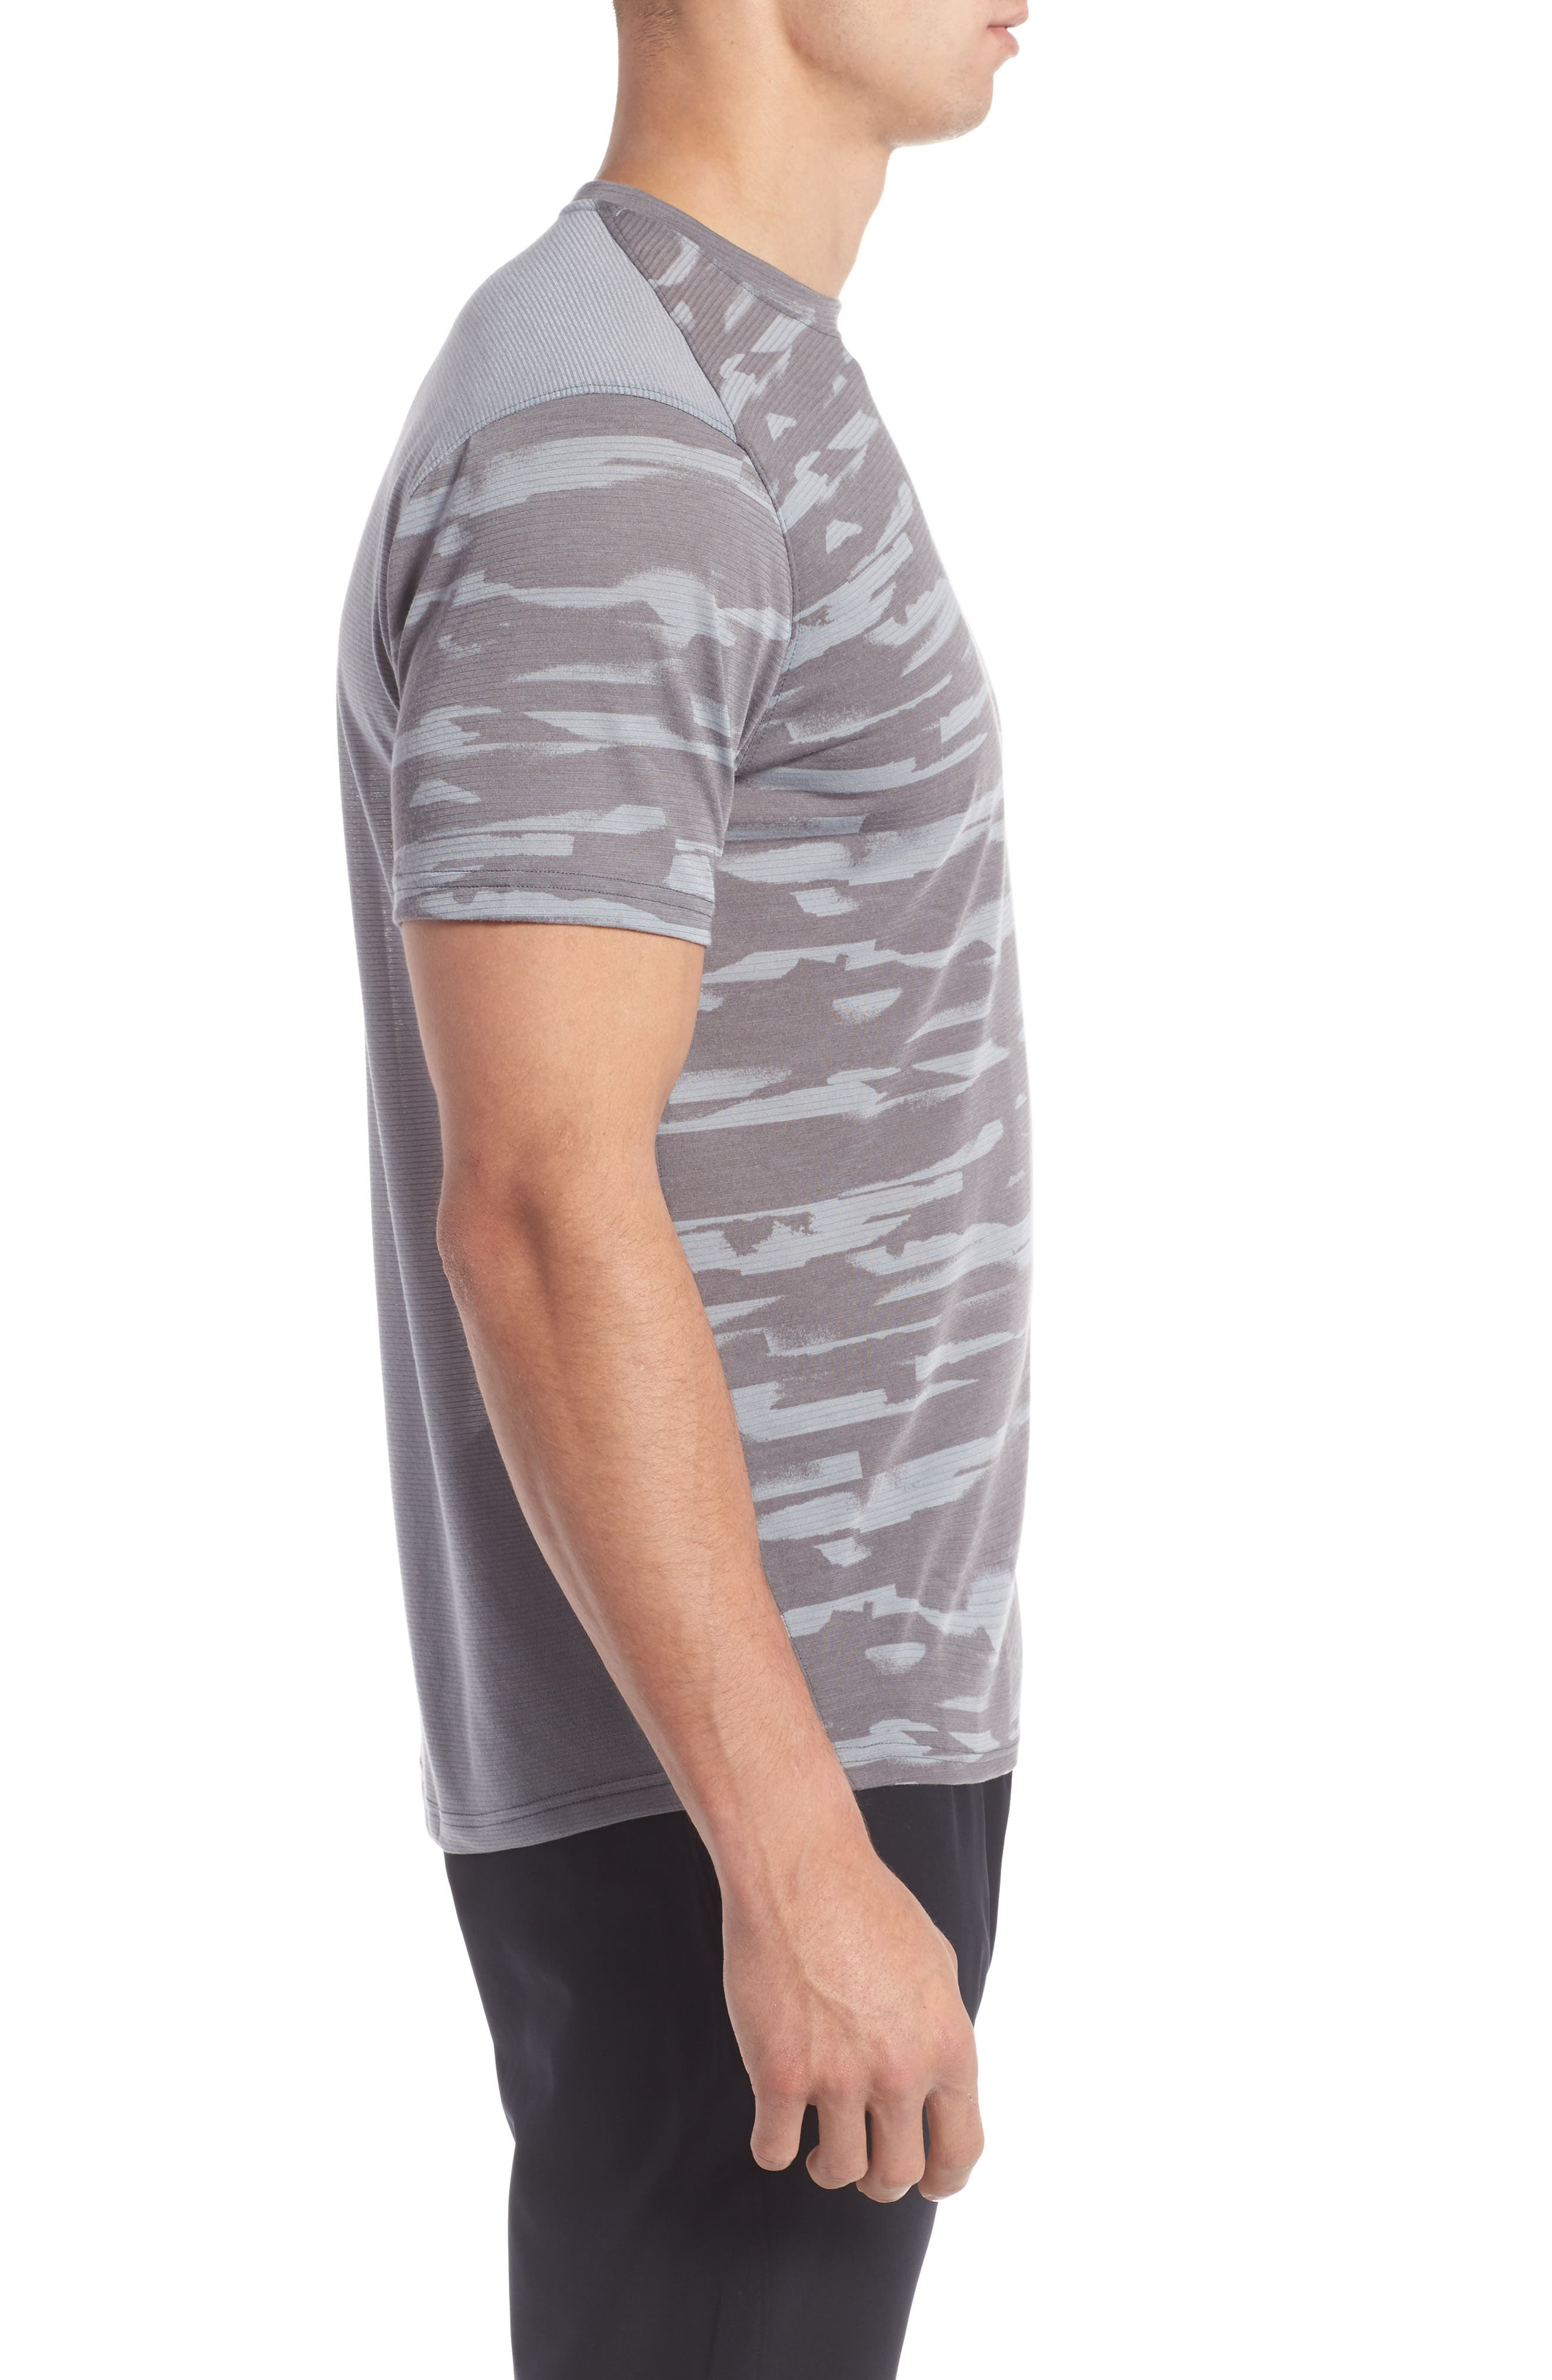 Threadborne Mesh Running T-Shirt,                             Alternate thumbnail 3, color,                             Grey / Black / Reflective